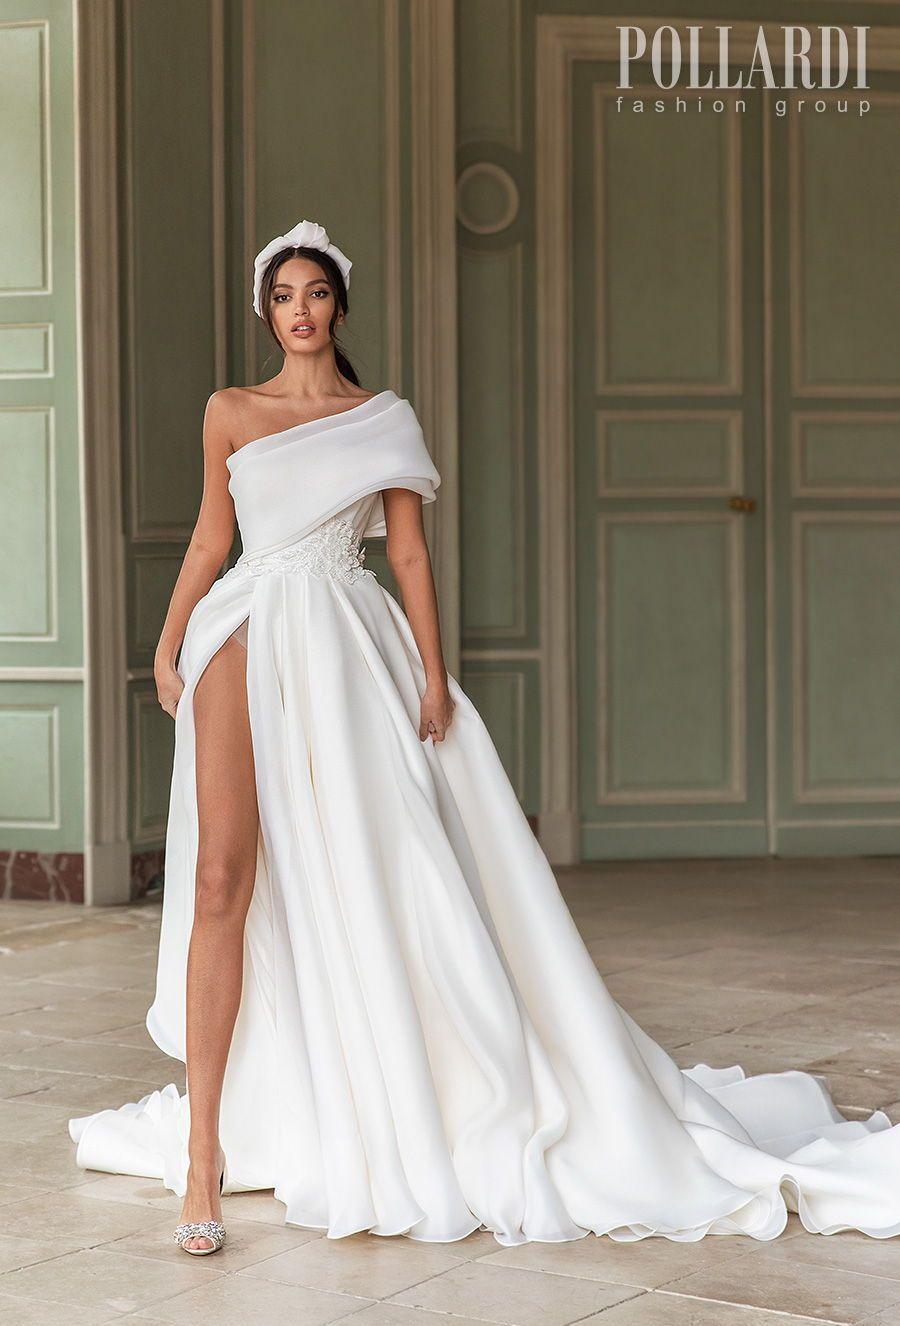 Pollardi Wedding Dresses Royalty Bridal Collection Wedding Inspirasi Elegant White Prom Dresses Cocktail Dress Wedding Custom Bridal Dress [ 1326 x 900 Pixel ]